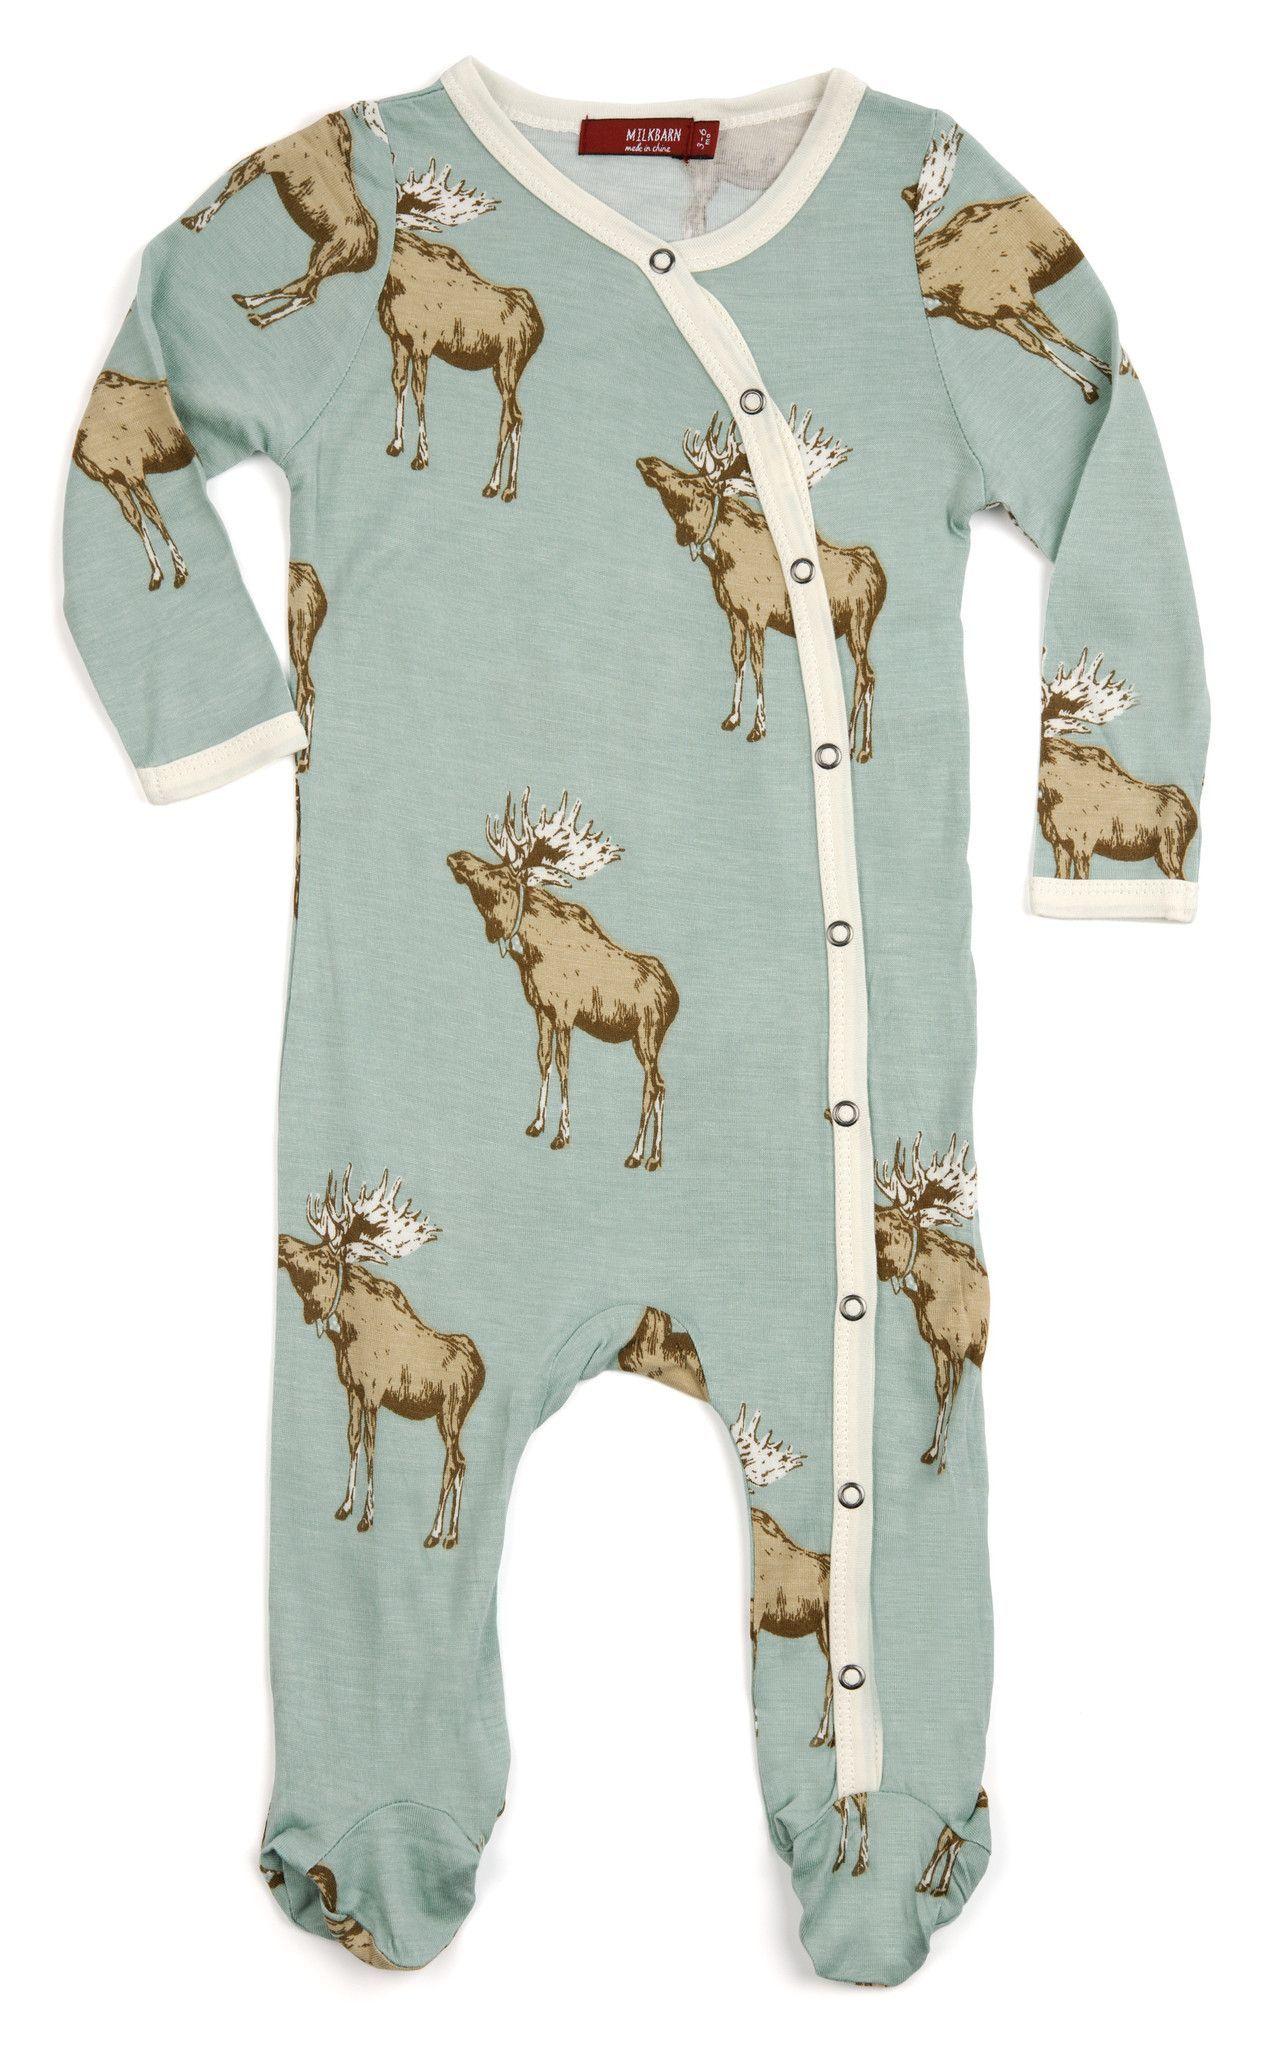 MilkBarn Baby Bamboo Footed Romper Bow Tie Moose